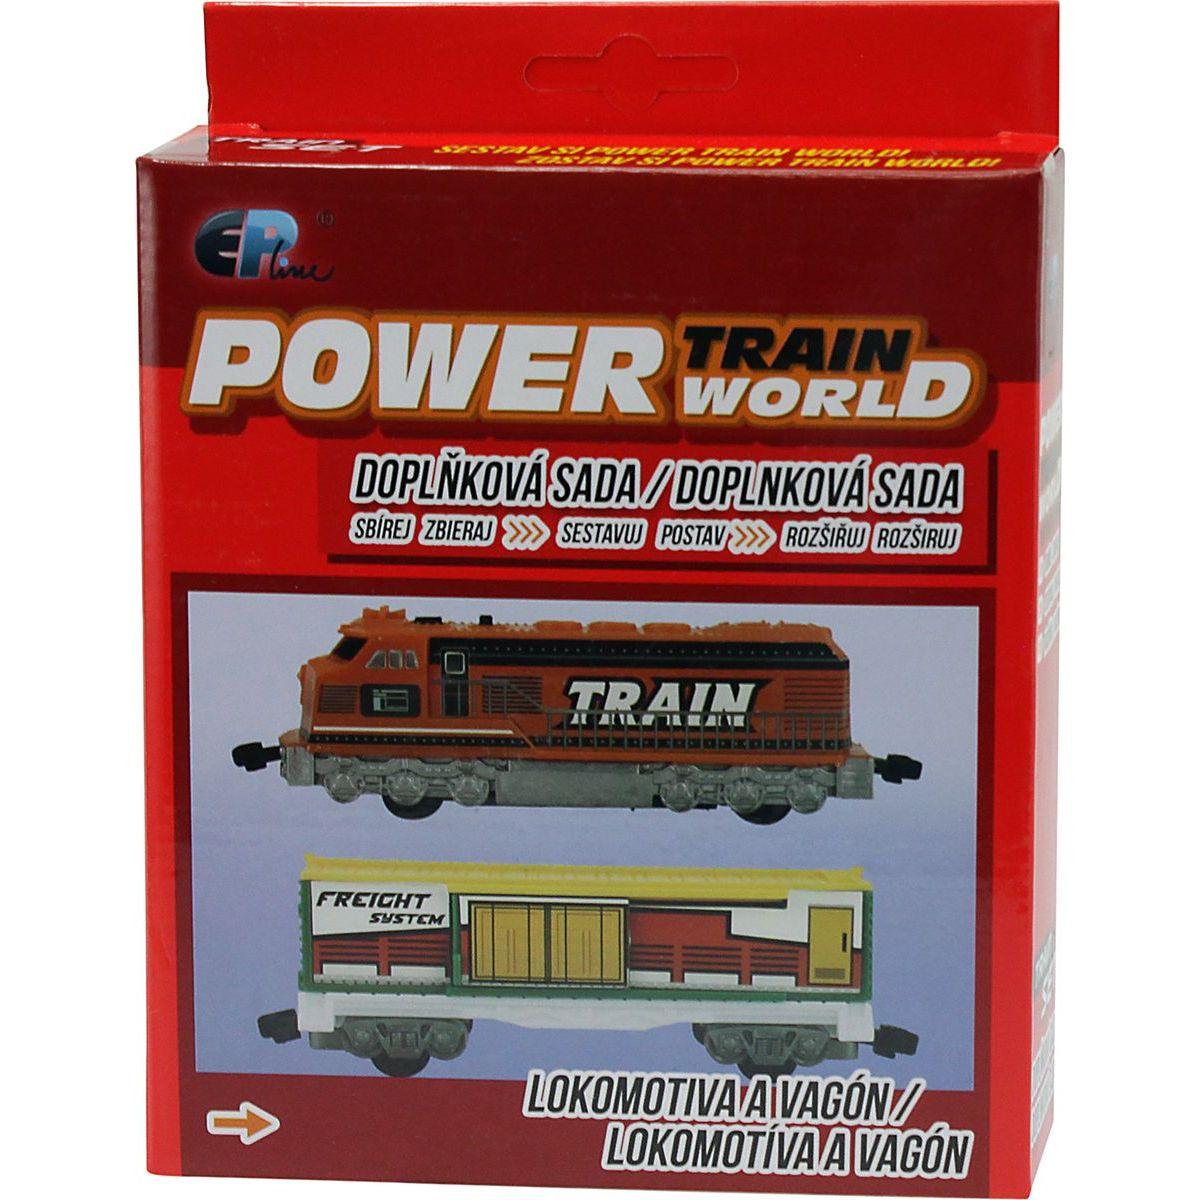 Power Train World Lokomotiva a vagón